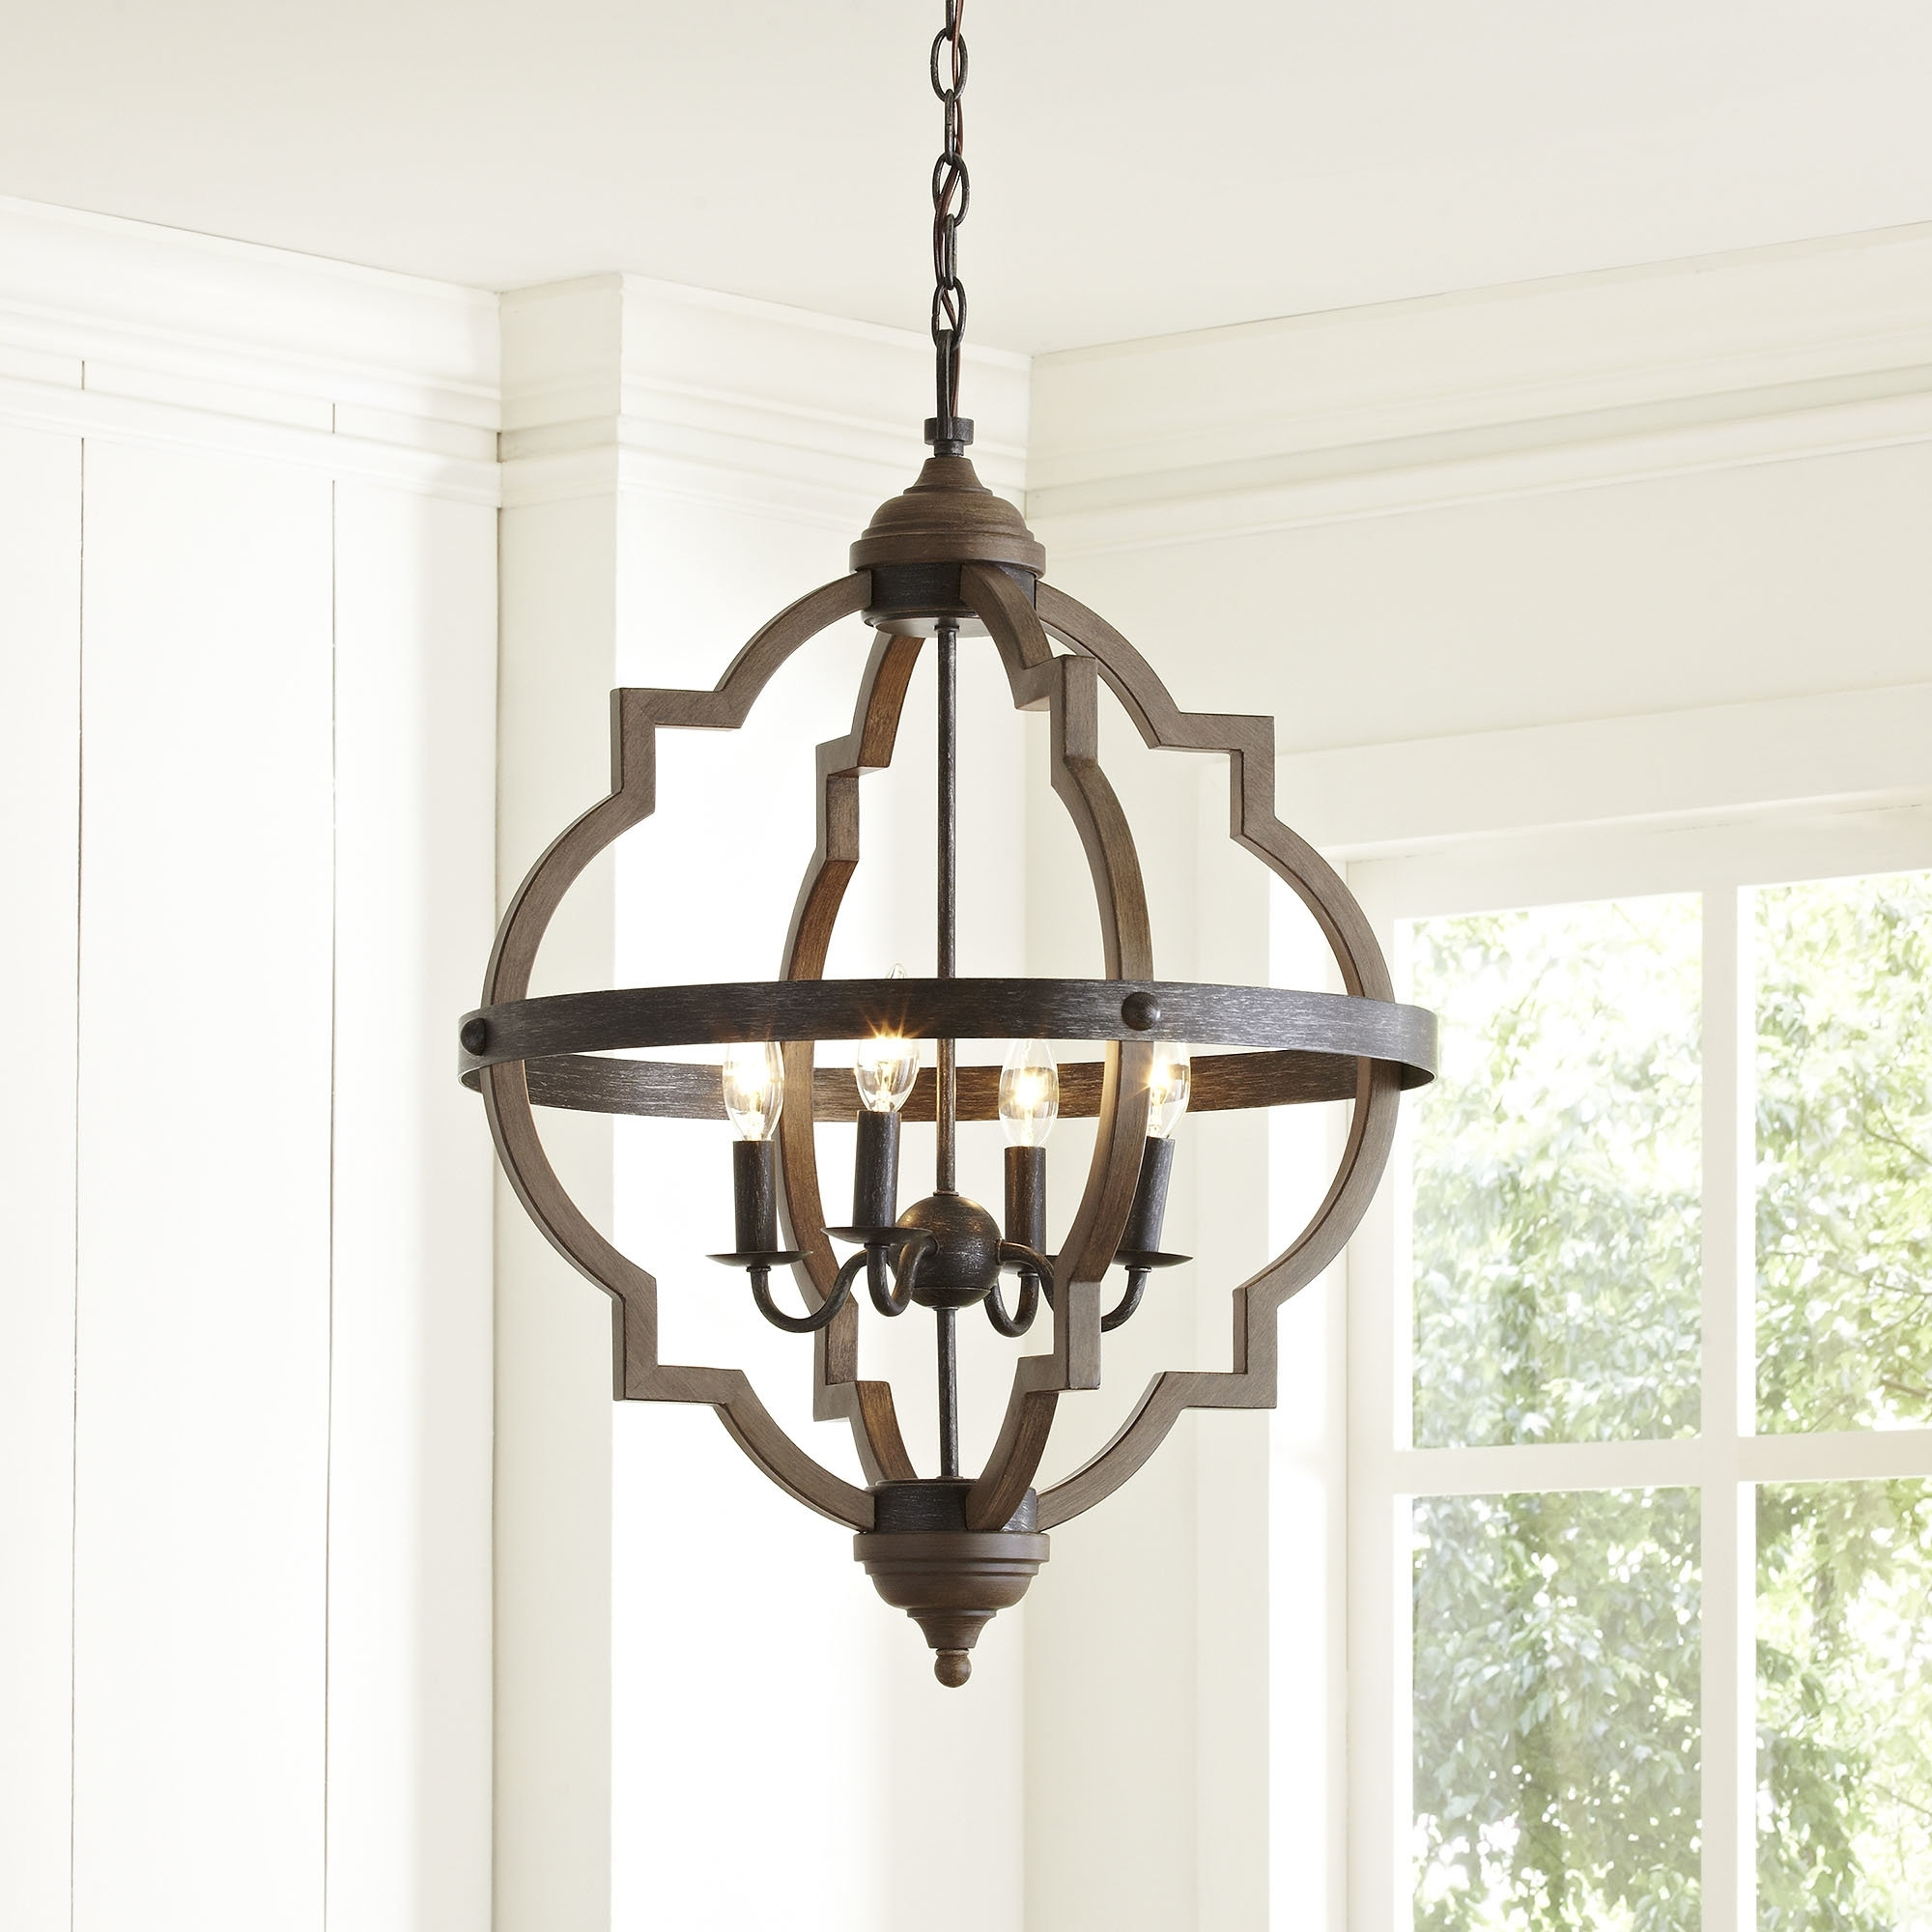 Preferred Wayfair Chandeliers In Stunning Design Ideas Wayfair Lighting Chandeliers Decoration You Ll (View 10 of 15)